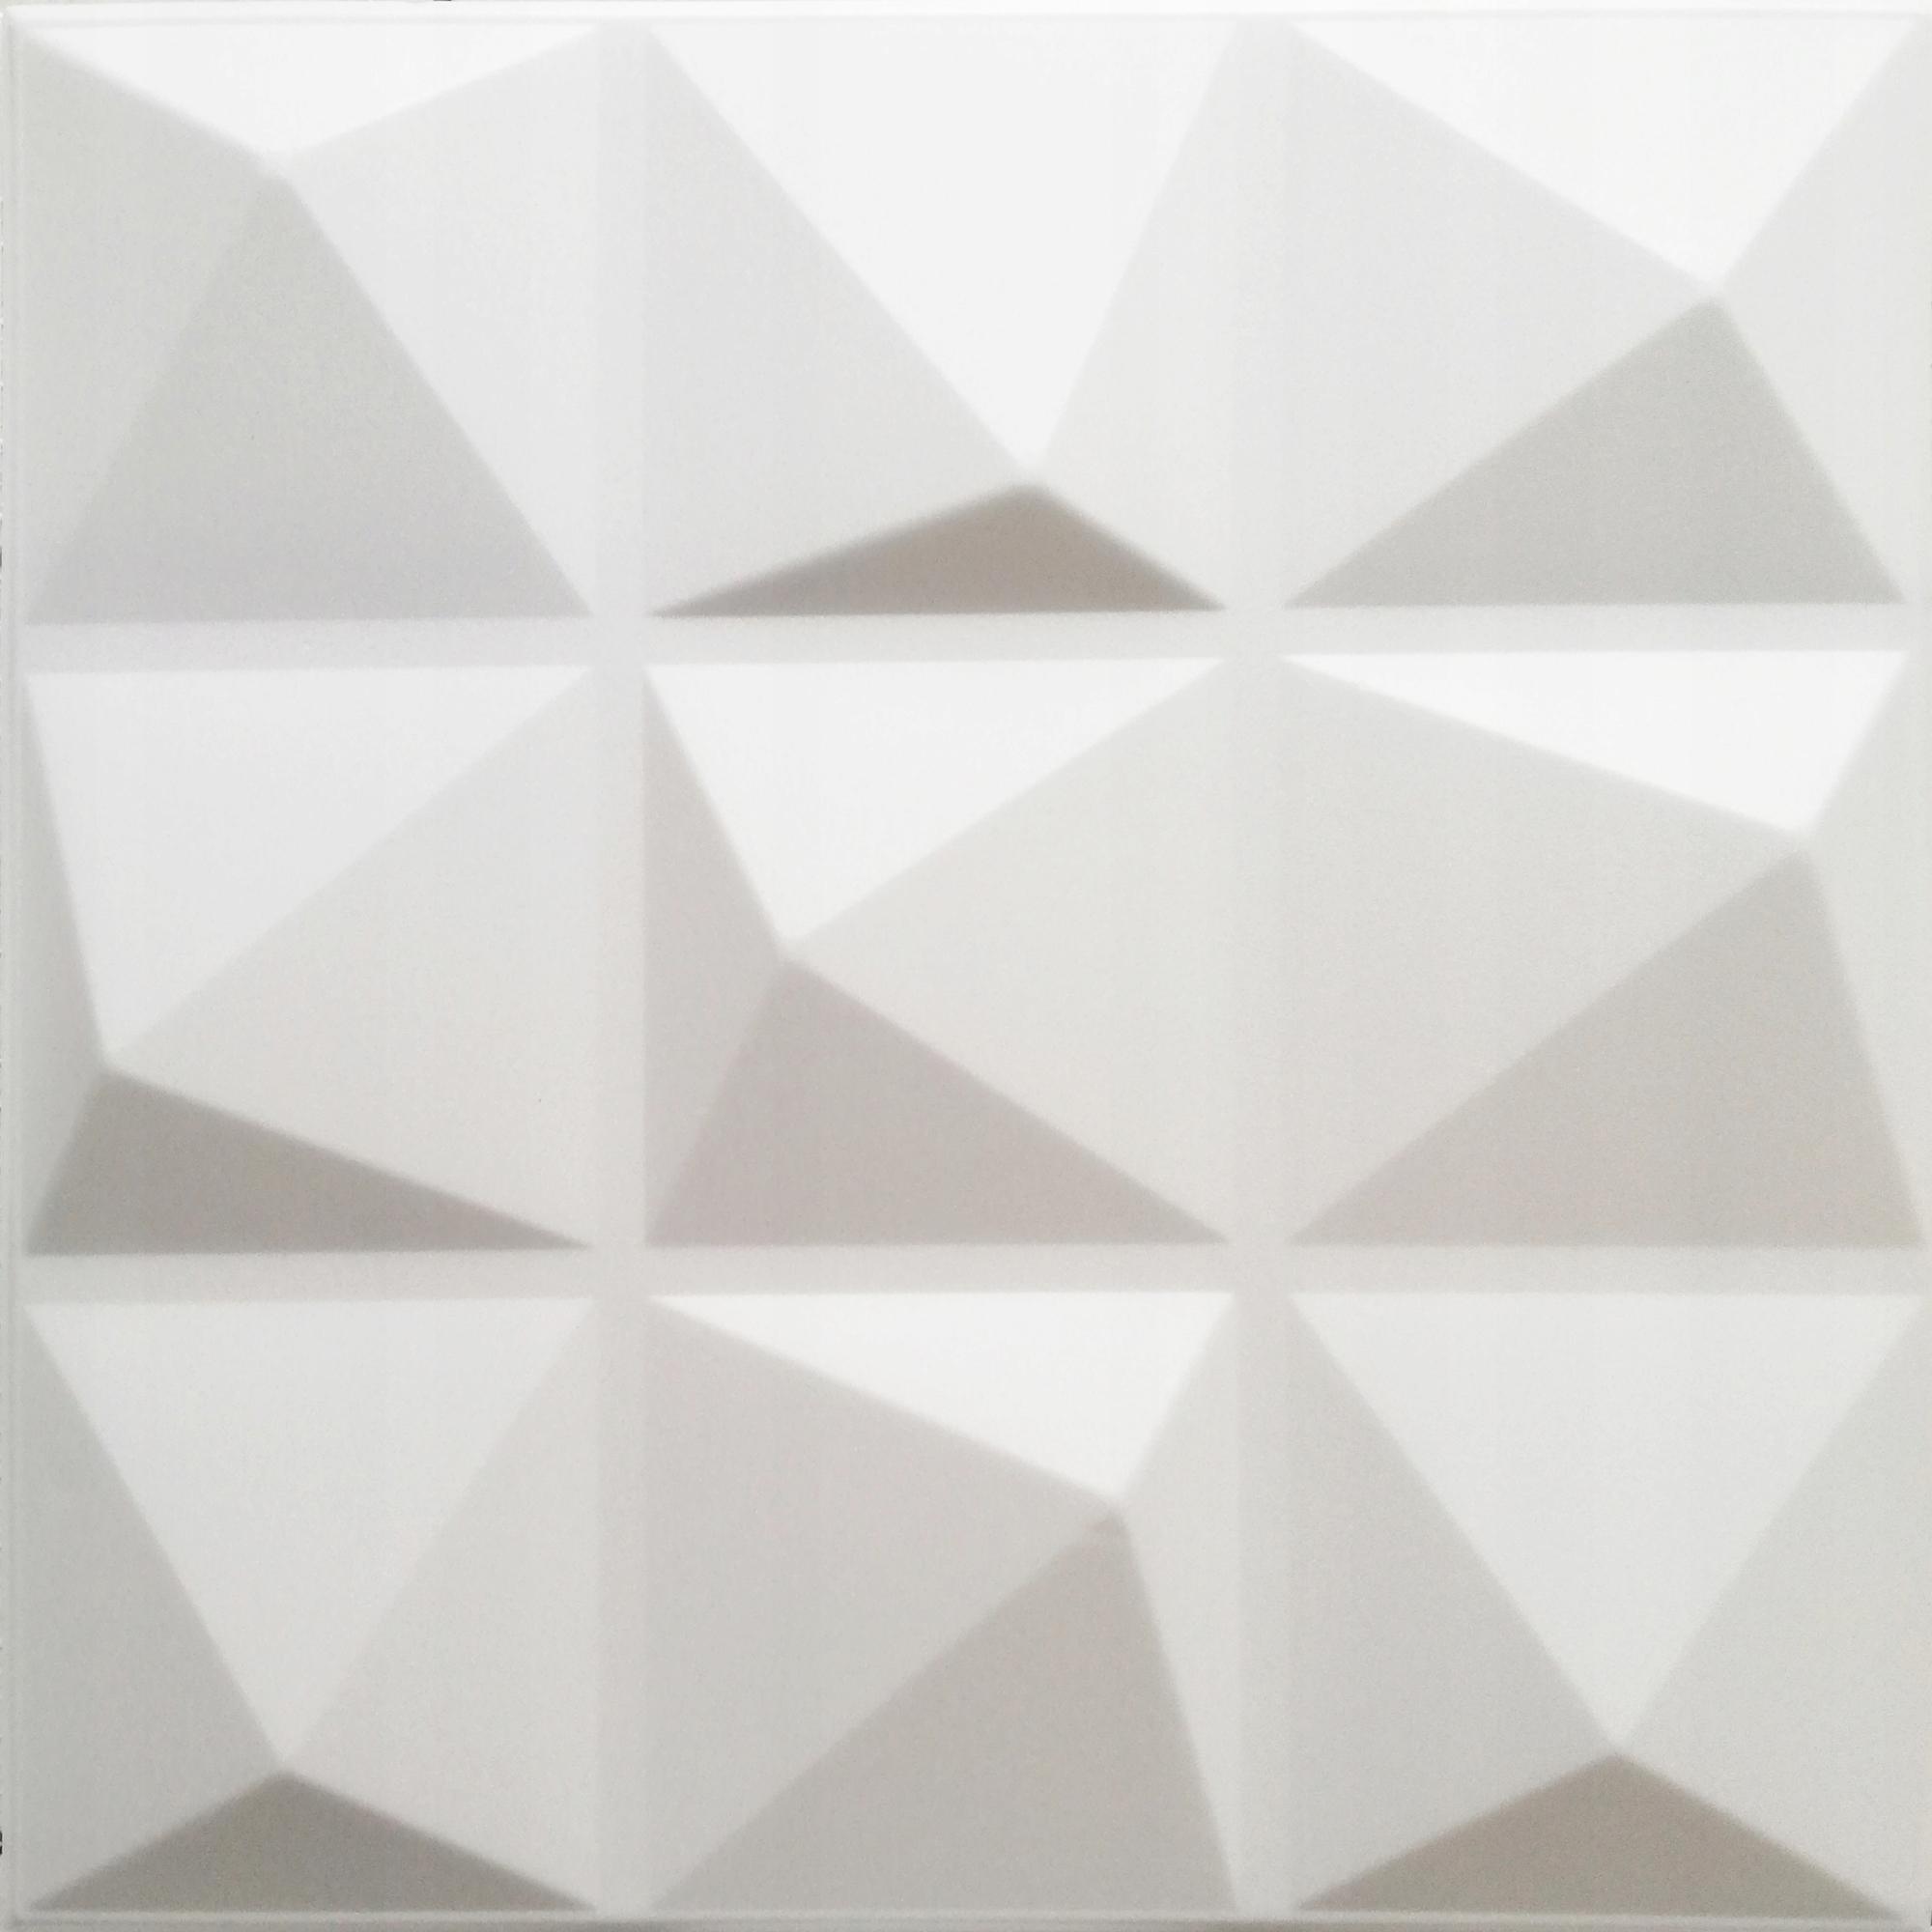 Gut bekannt Deckenplatten Styroporplatten Polystyrolplatten Decke Dekor NL51